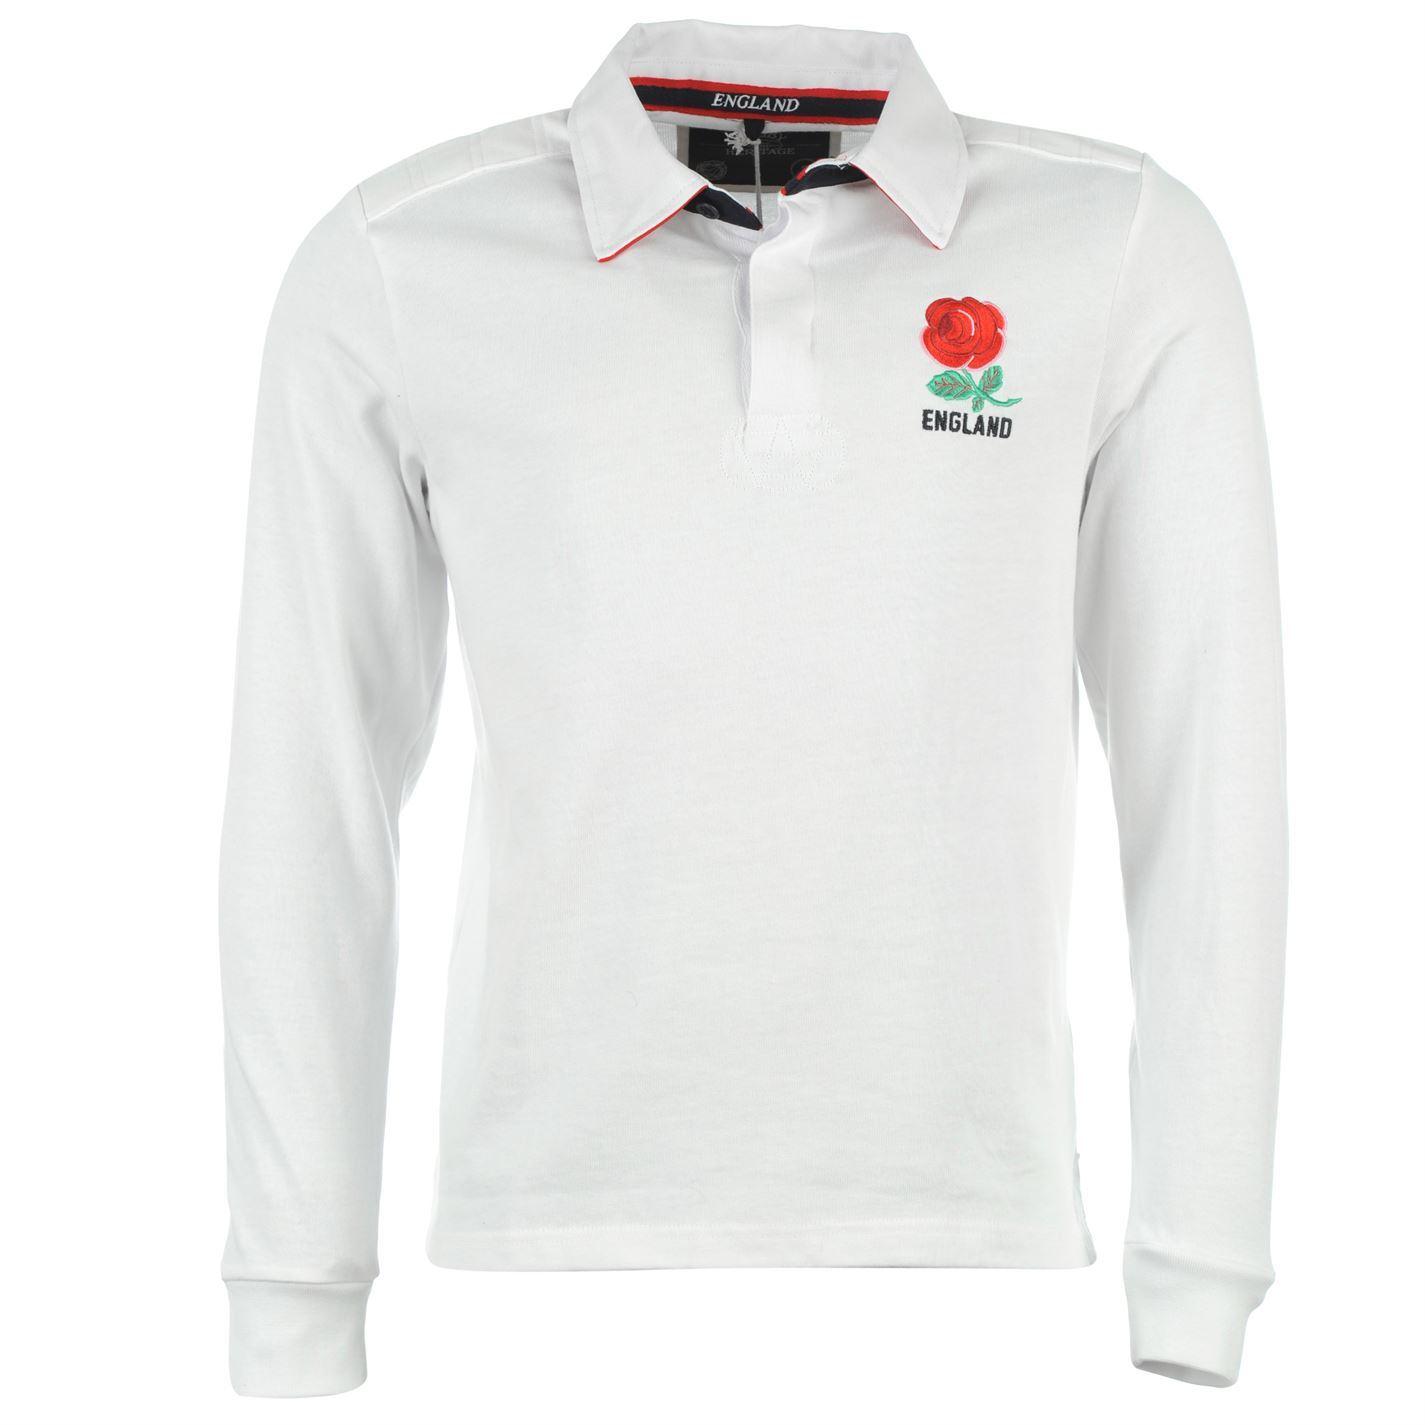 d0472ea71c834 Int Rugby De Manga Larga Camiseta Polo Clásico Hombres Inglaterra ...